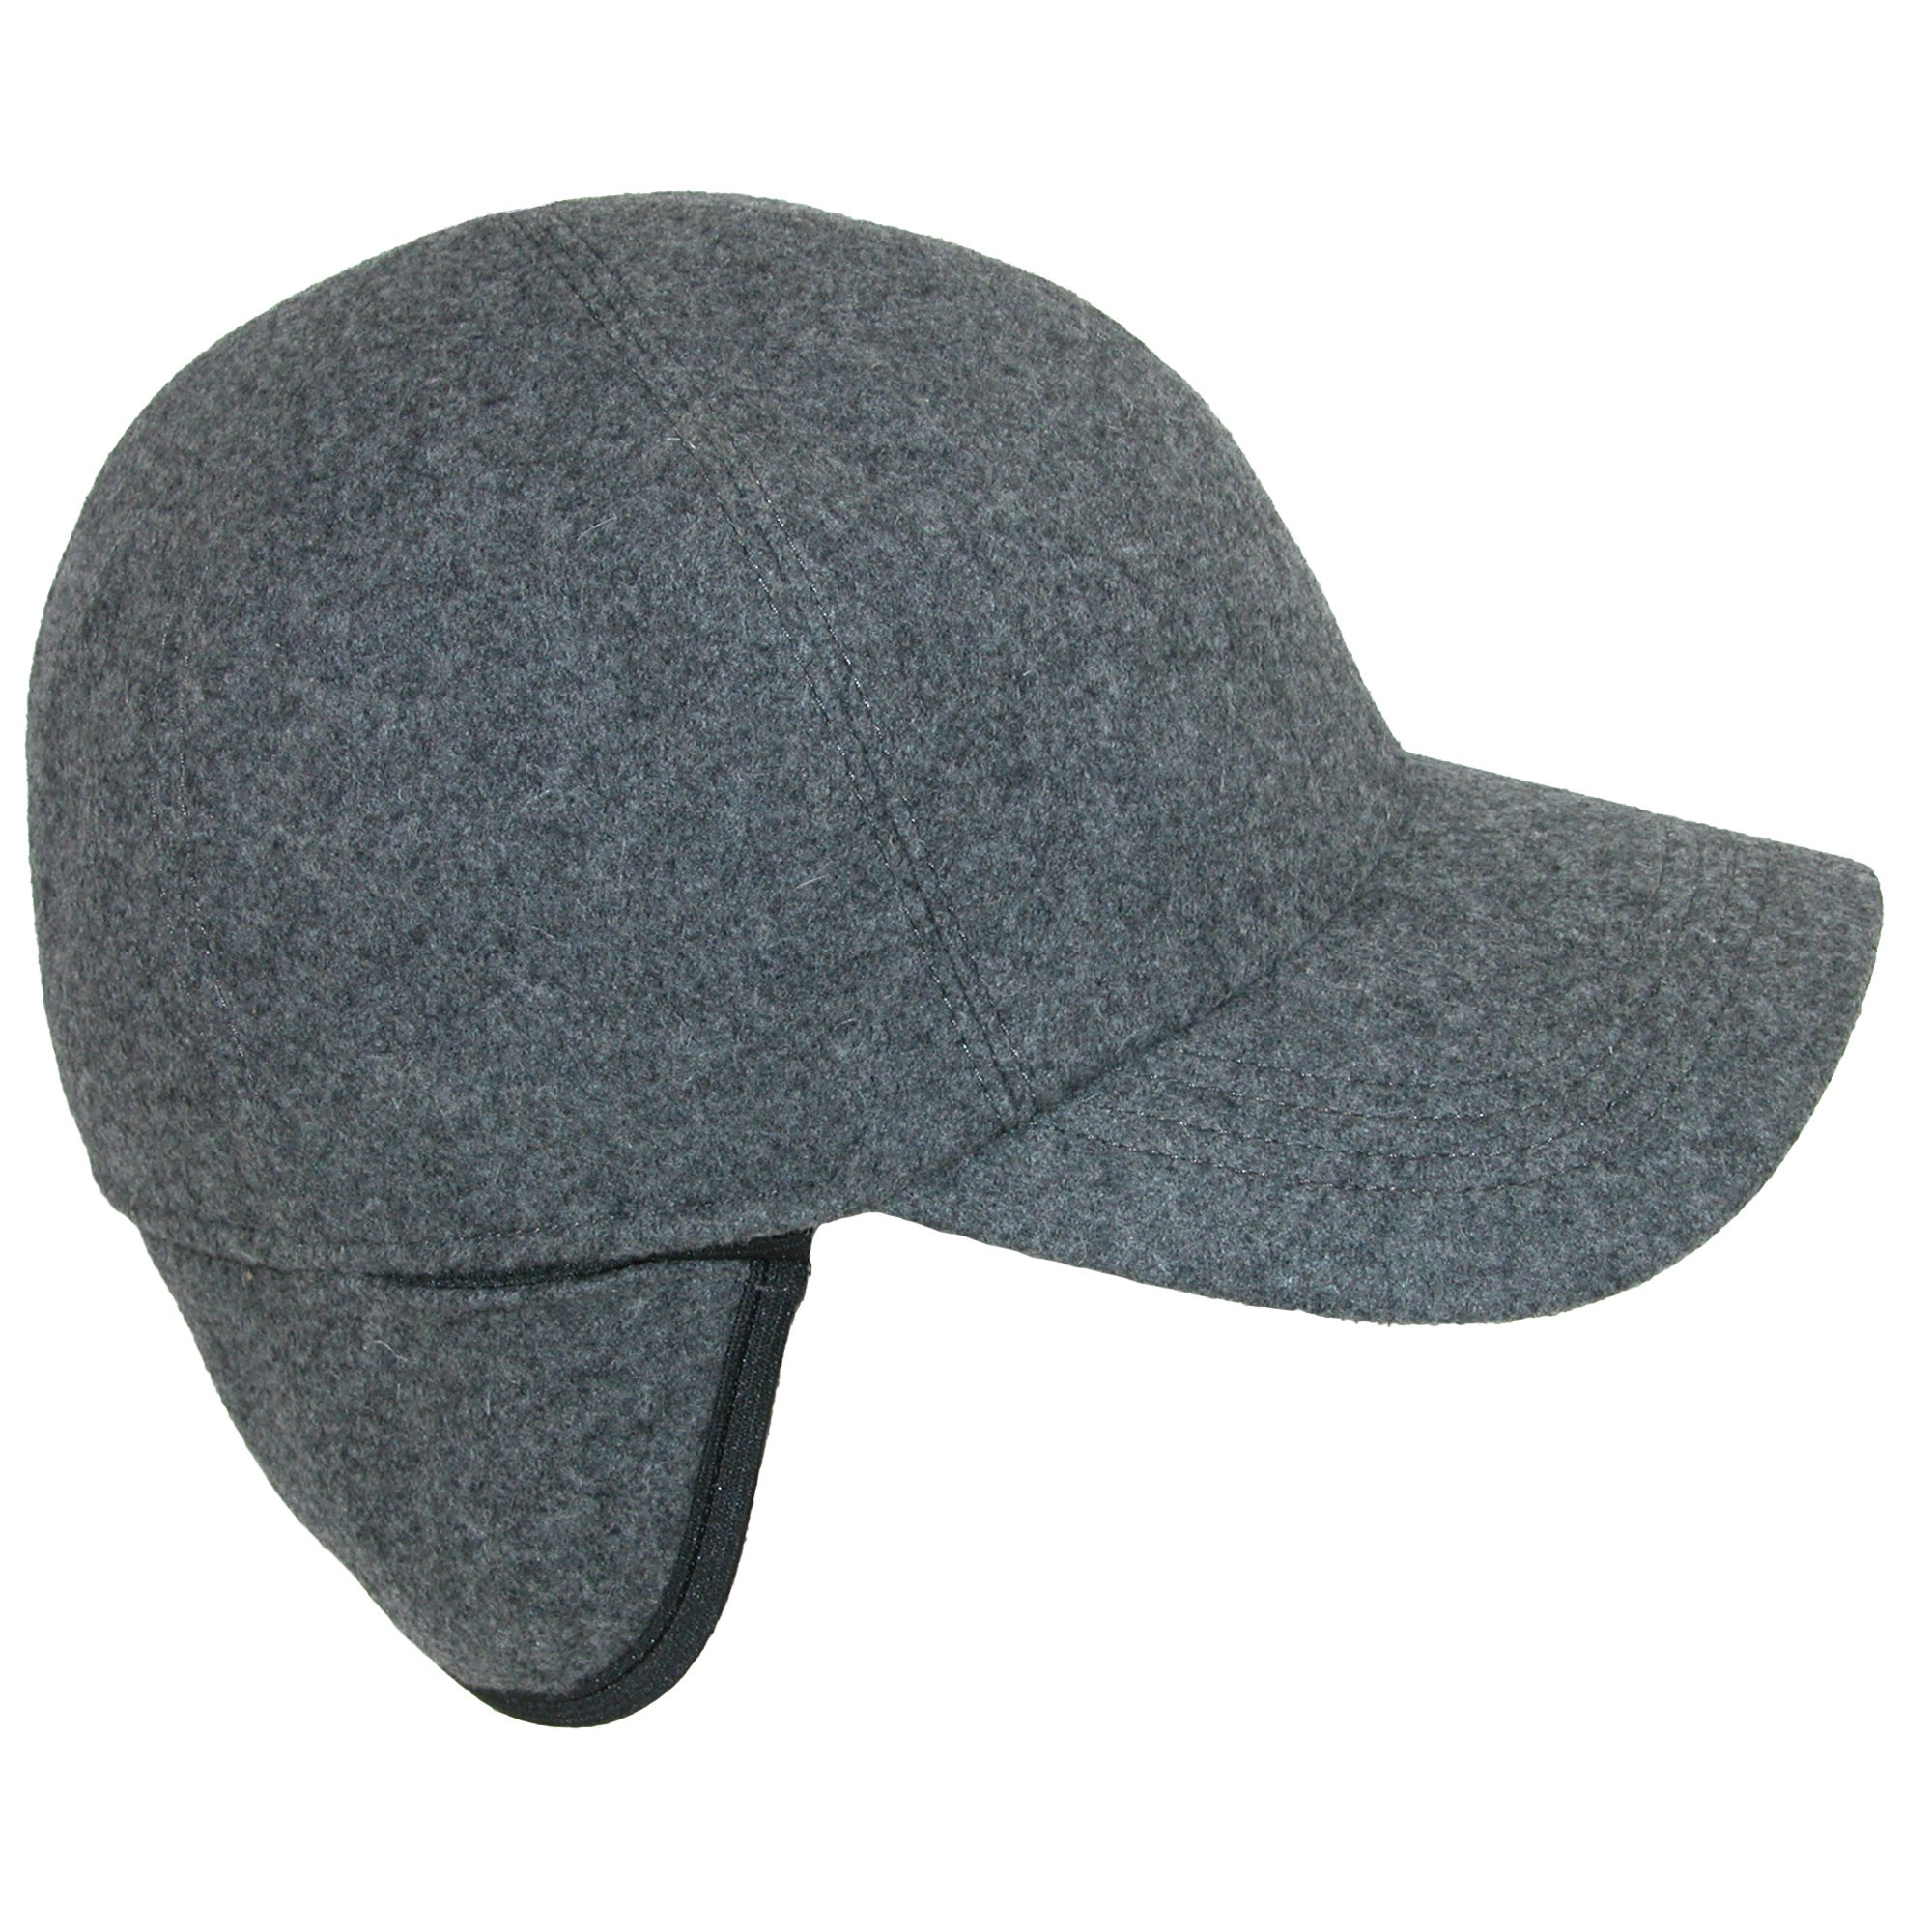 Shop Wigens Men s Wool Baseball Cap with Earflaps - Free Shipping ... 2beaa3a0d87